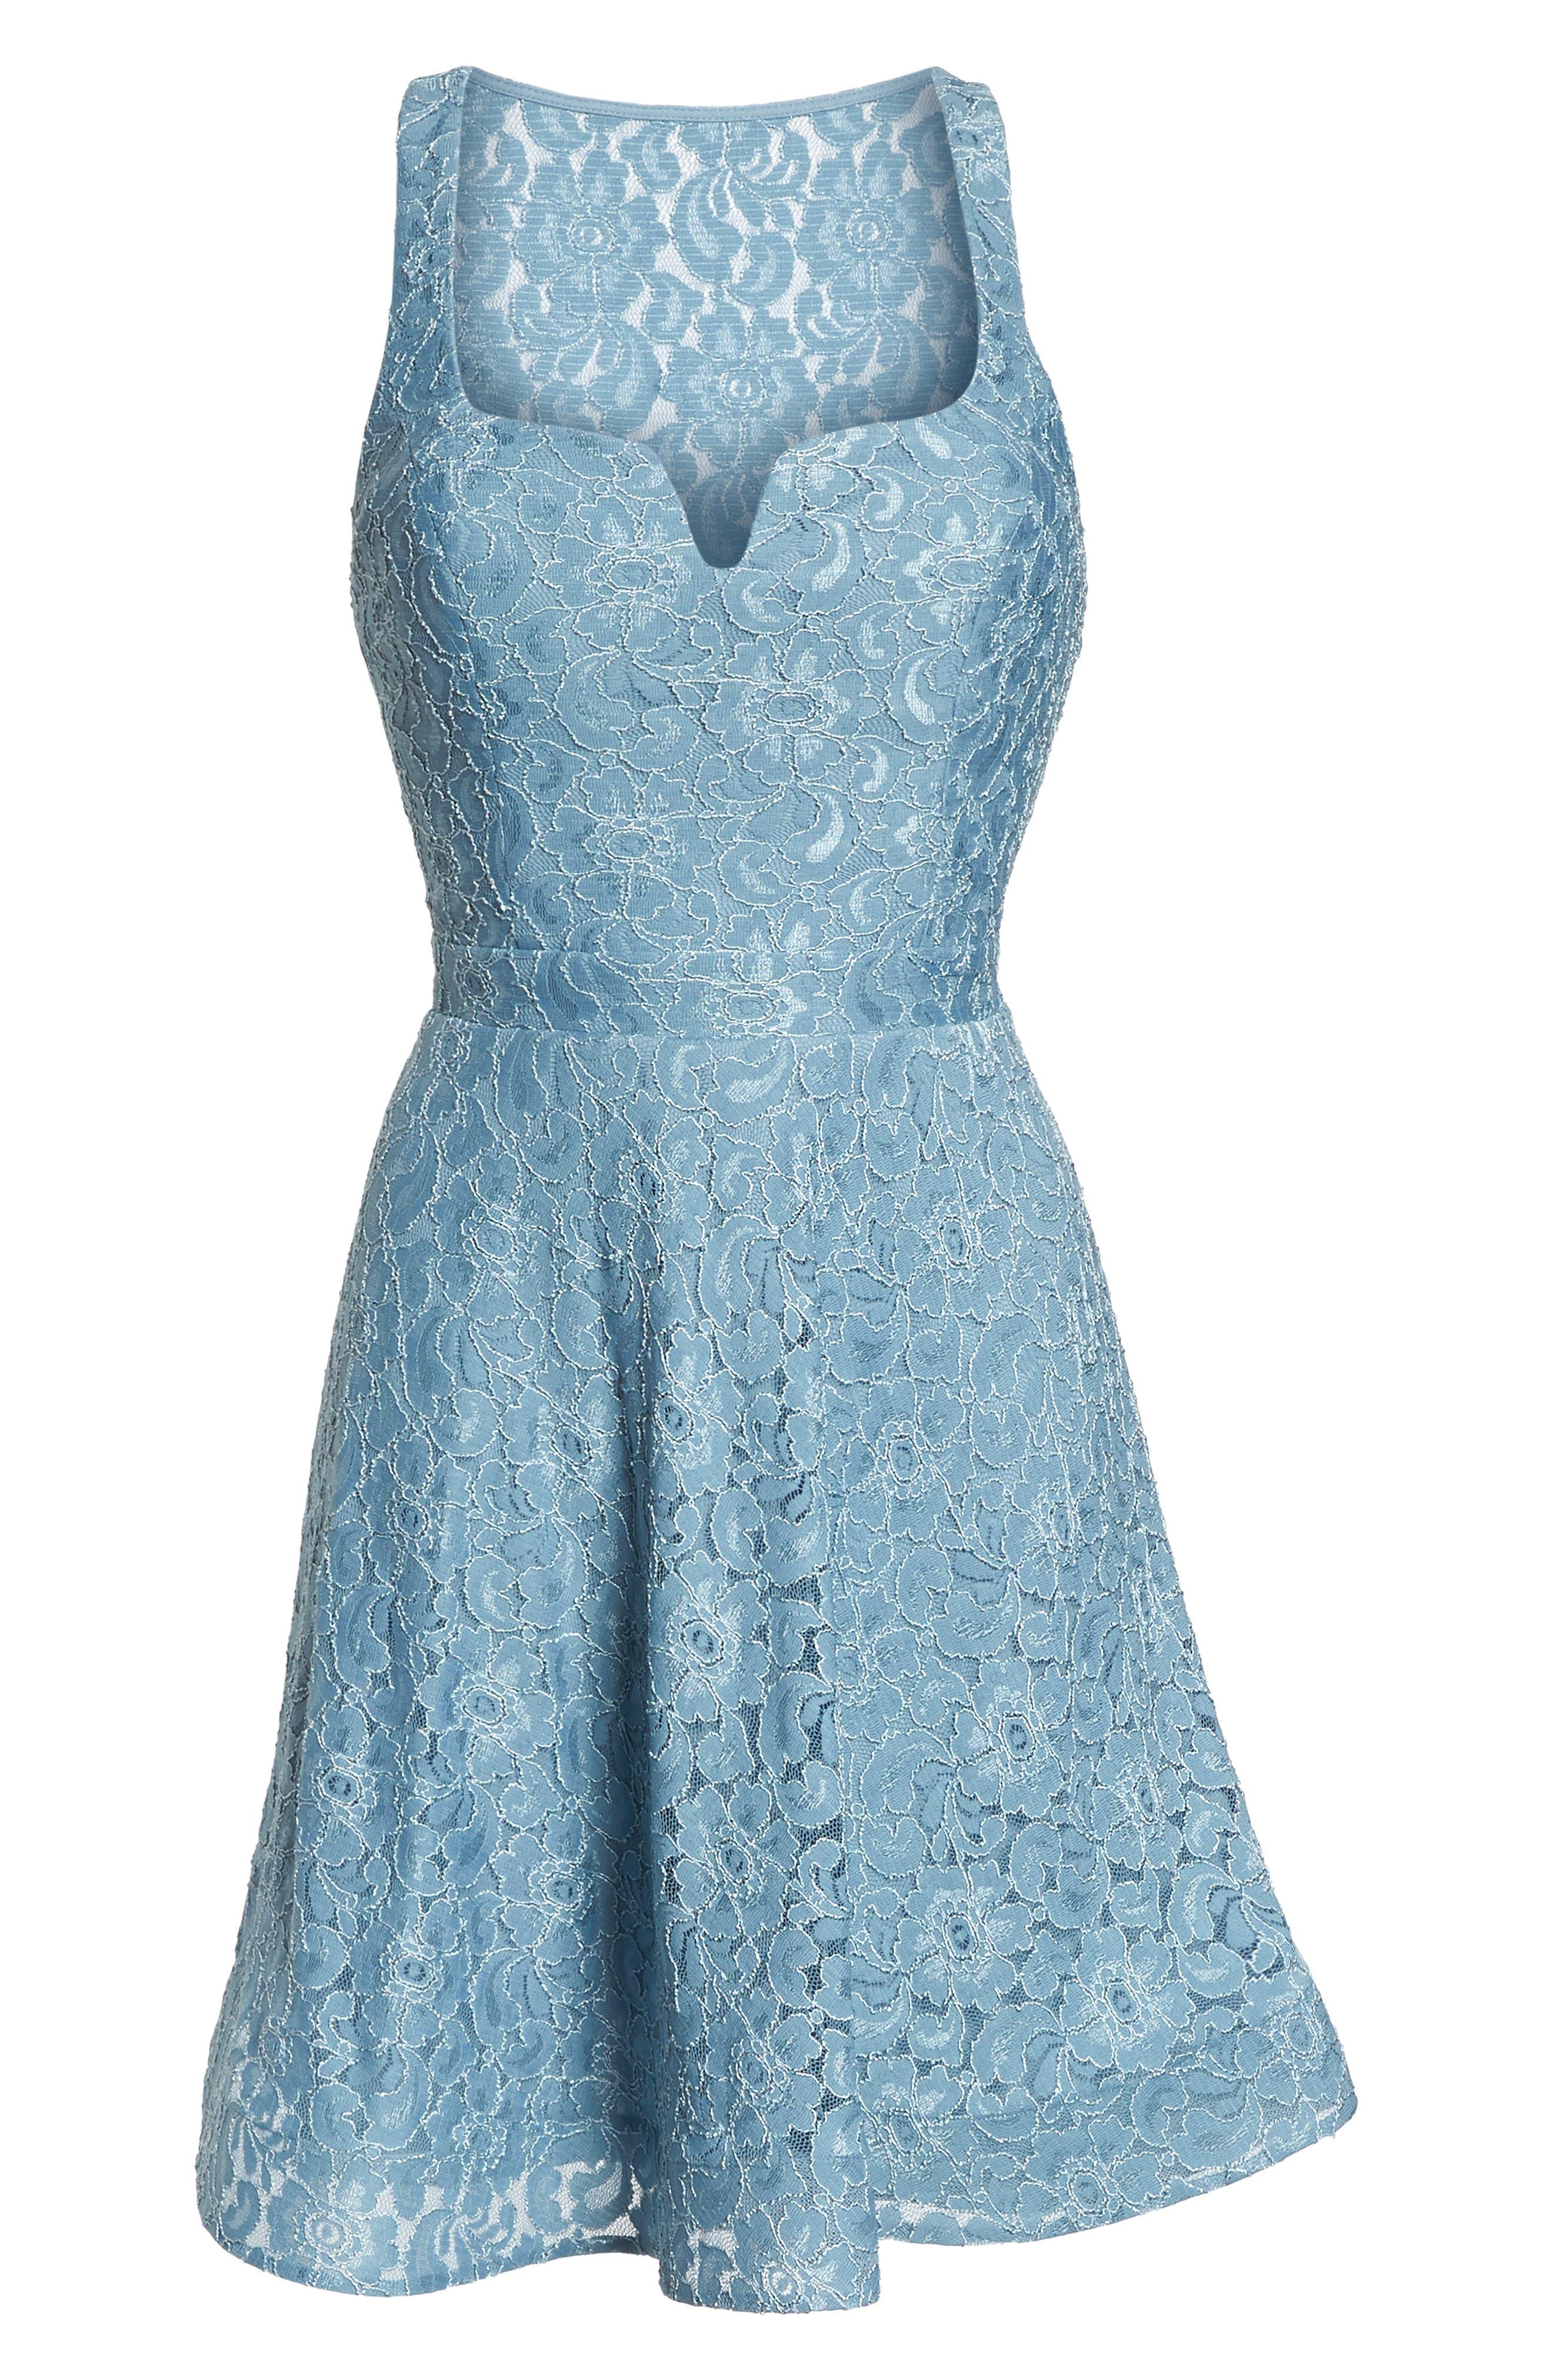 Notch Front Lace Fit & Flare Dress,                             Alternate thumbnail 6, color,                             BLUE